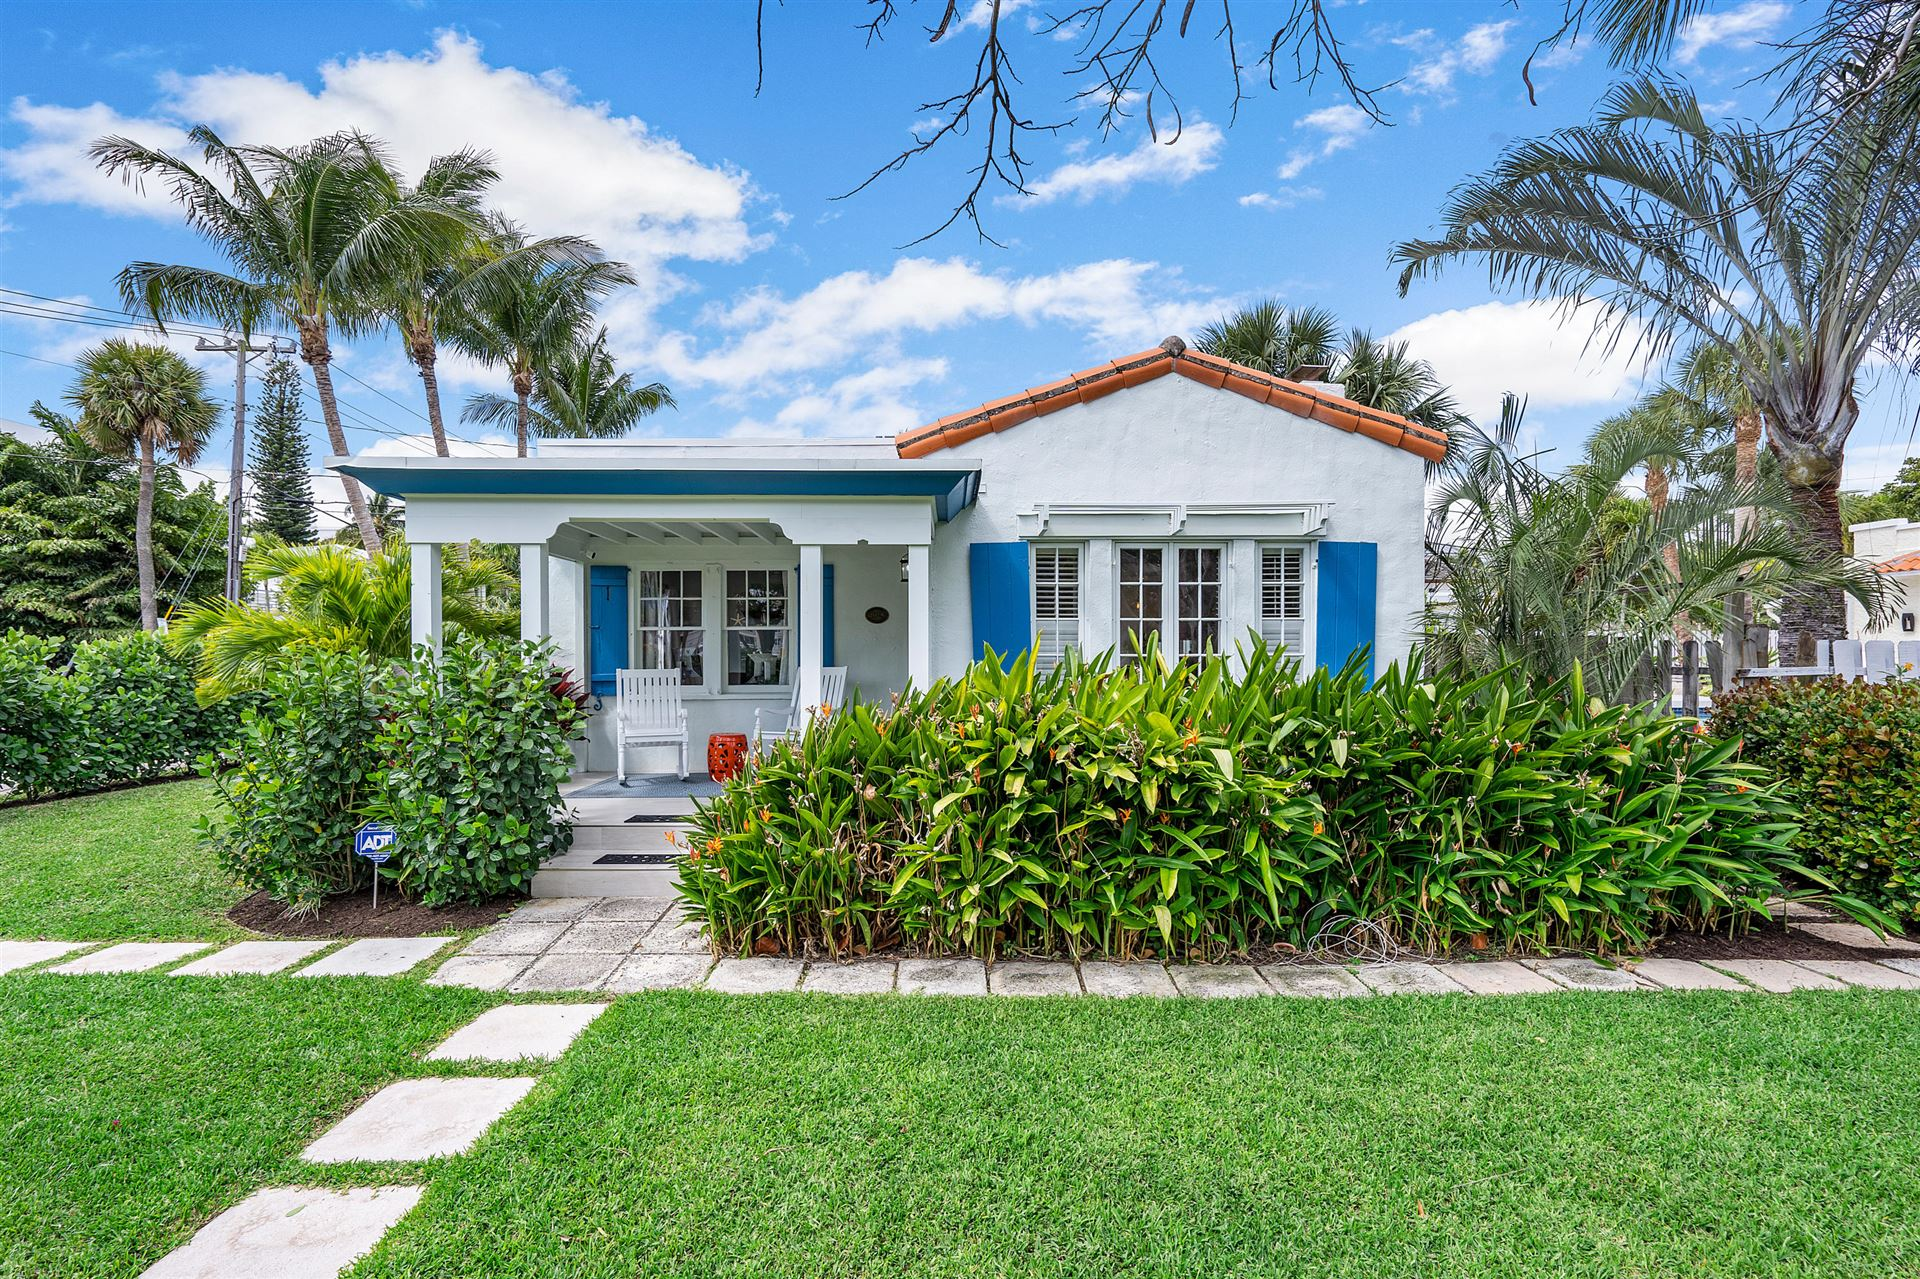 707 SE 1st Street, Delray Beach, FL 33483 - MLS#: RX-10699012